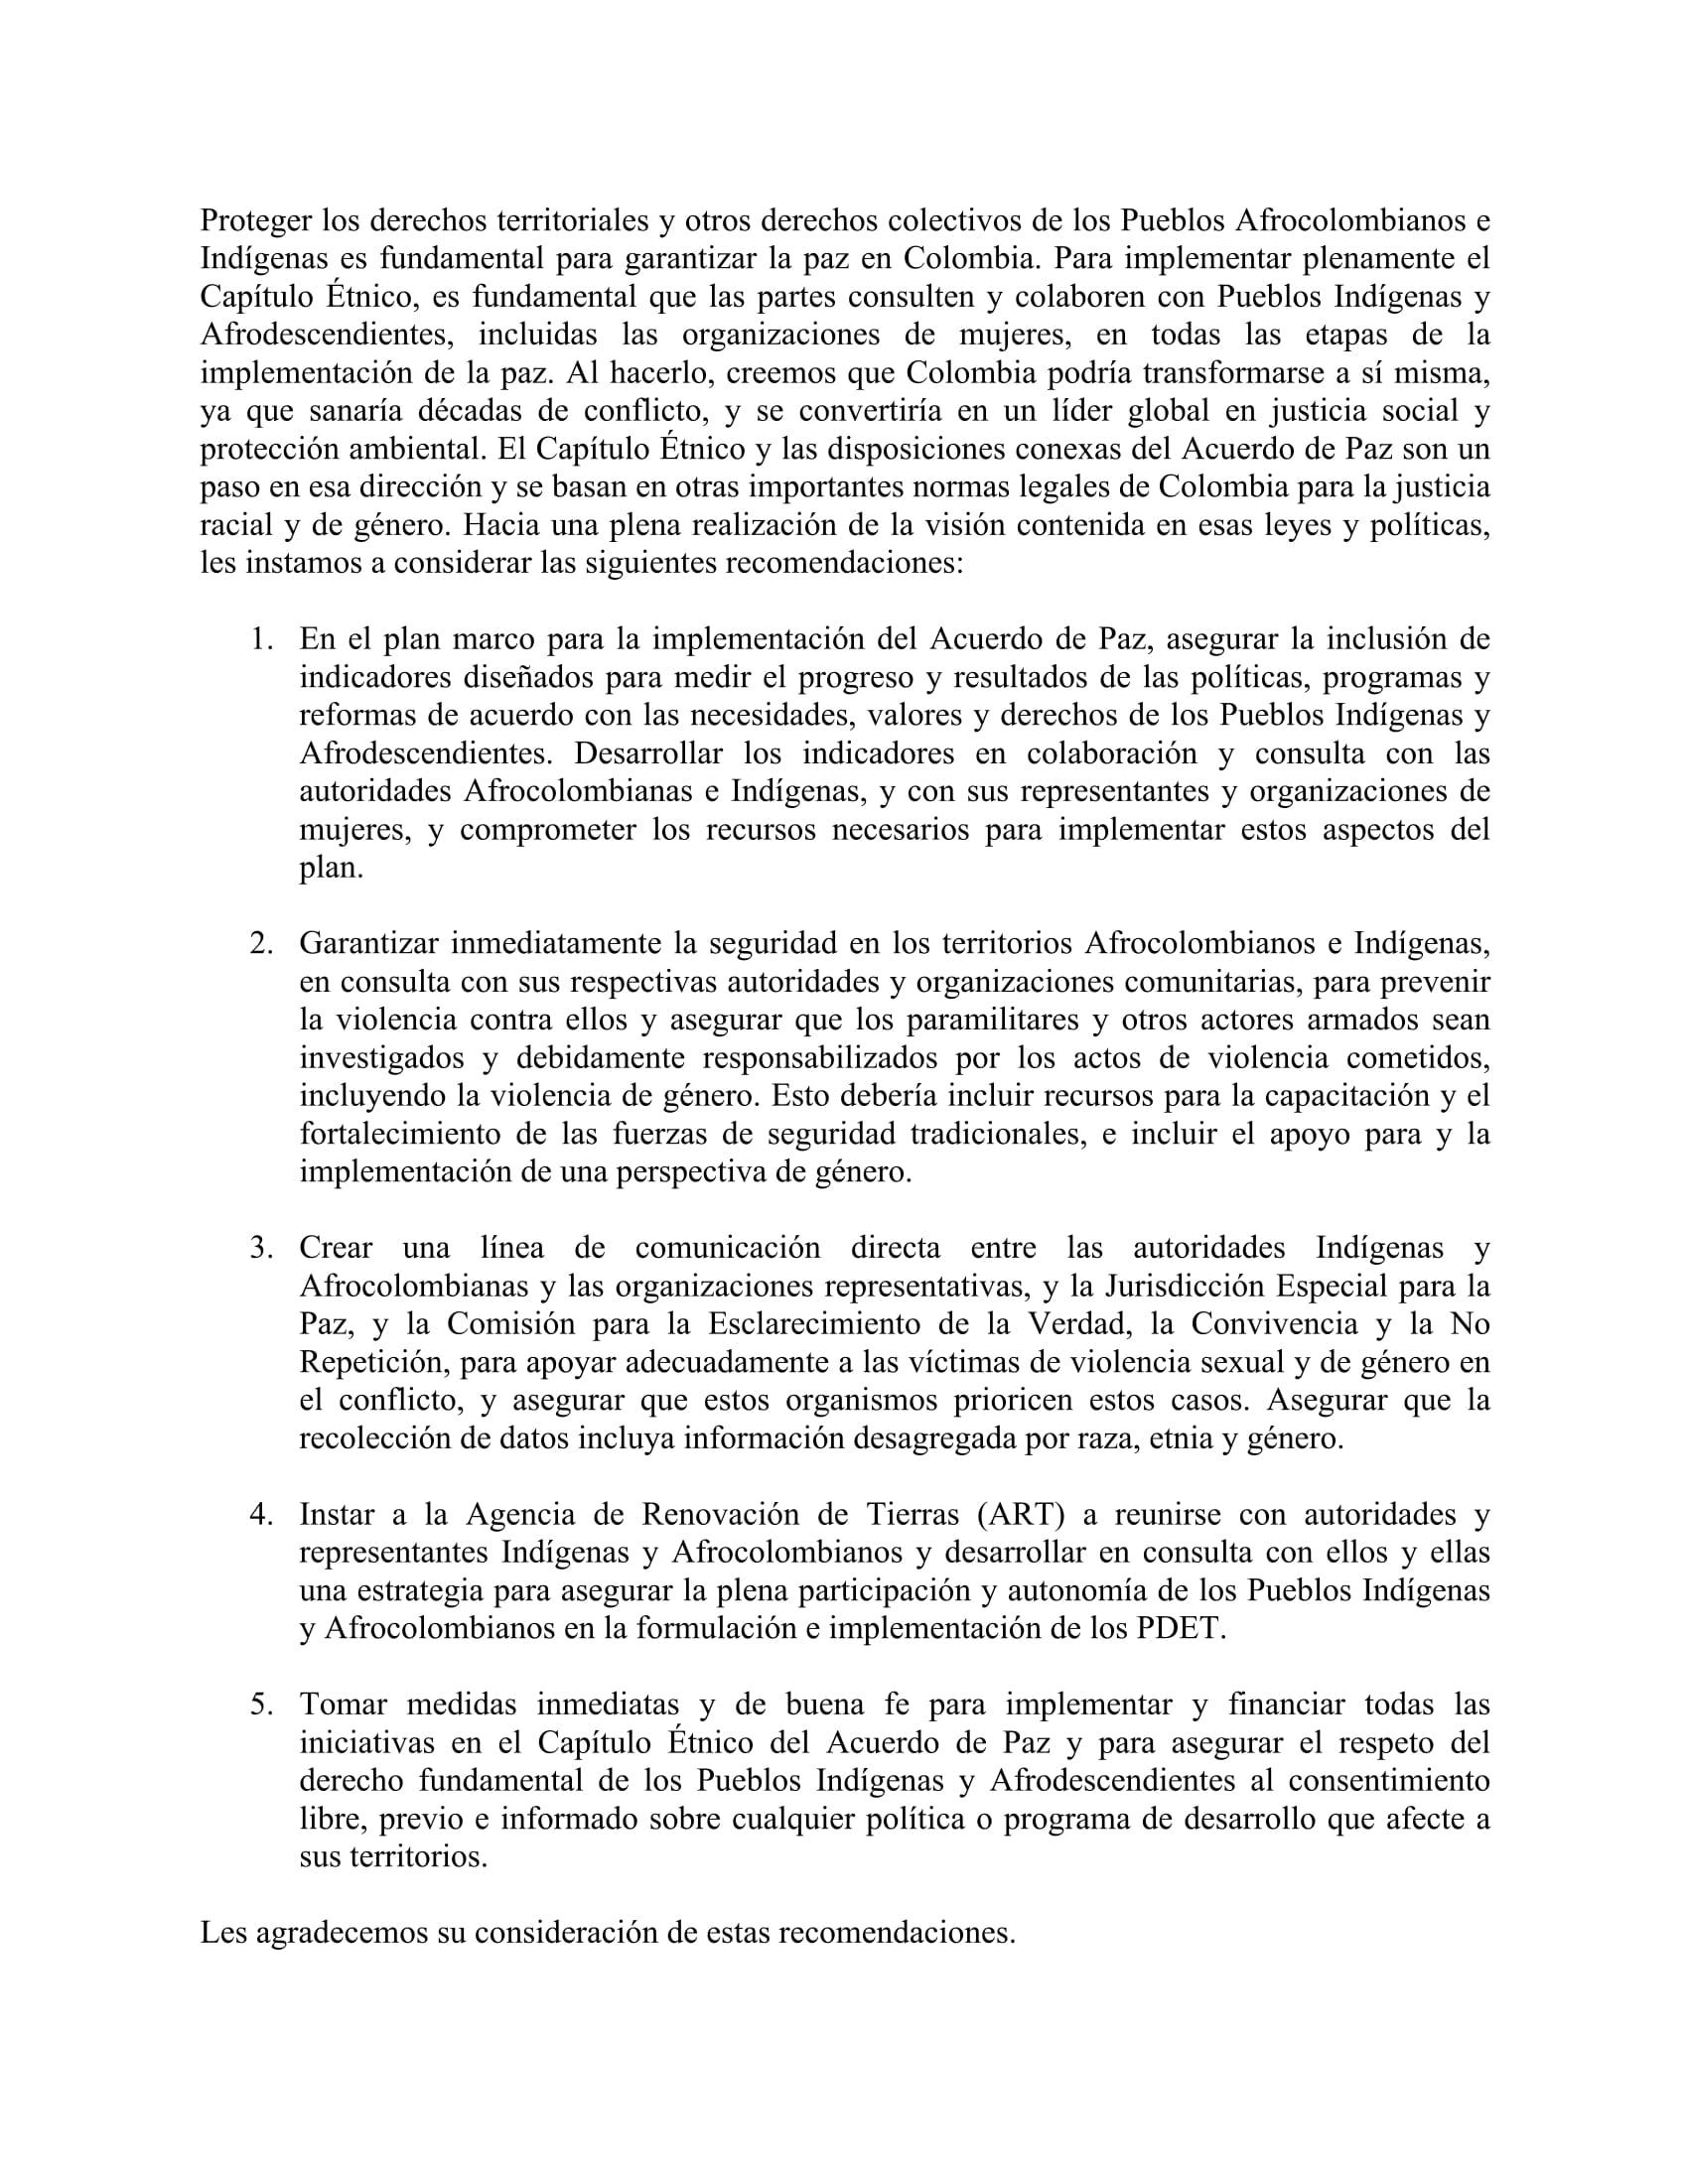 CartaSantosCsiviEspFINAL-3.jpg